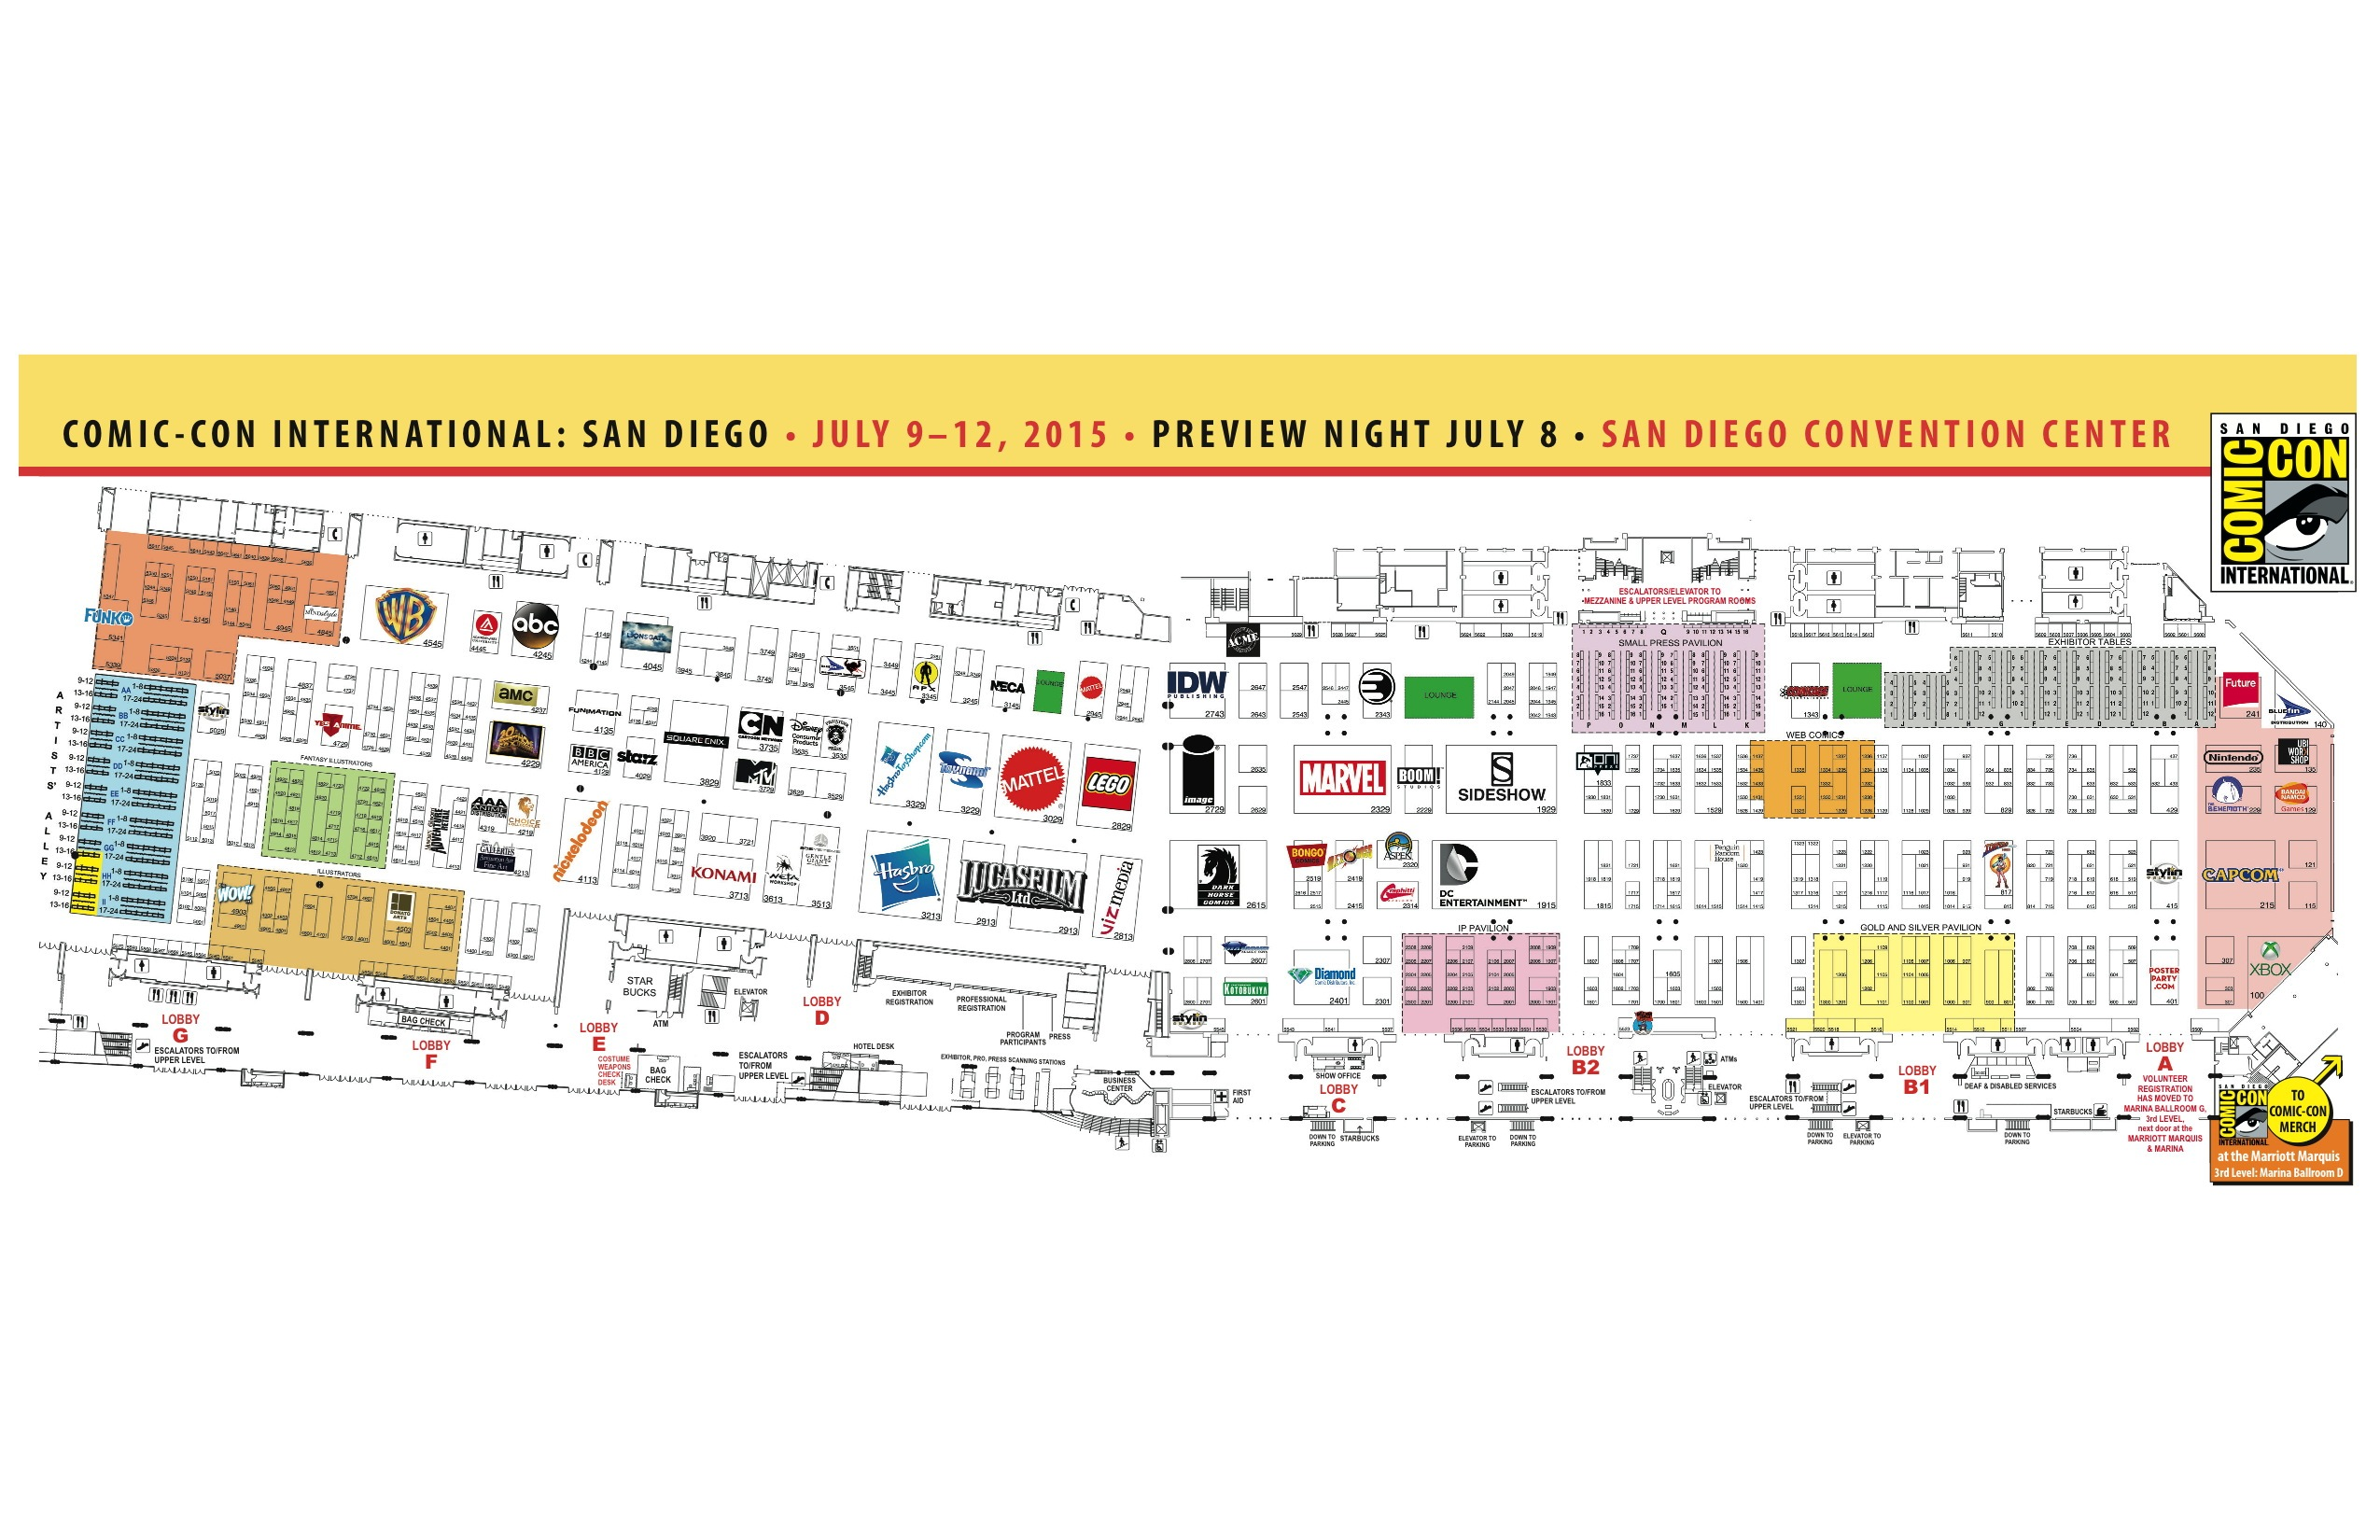 cci2015_exhibithall_map.jpg